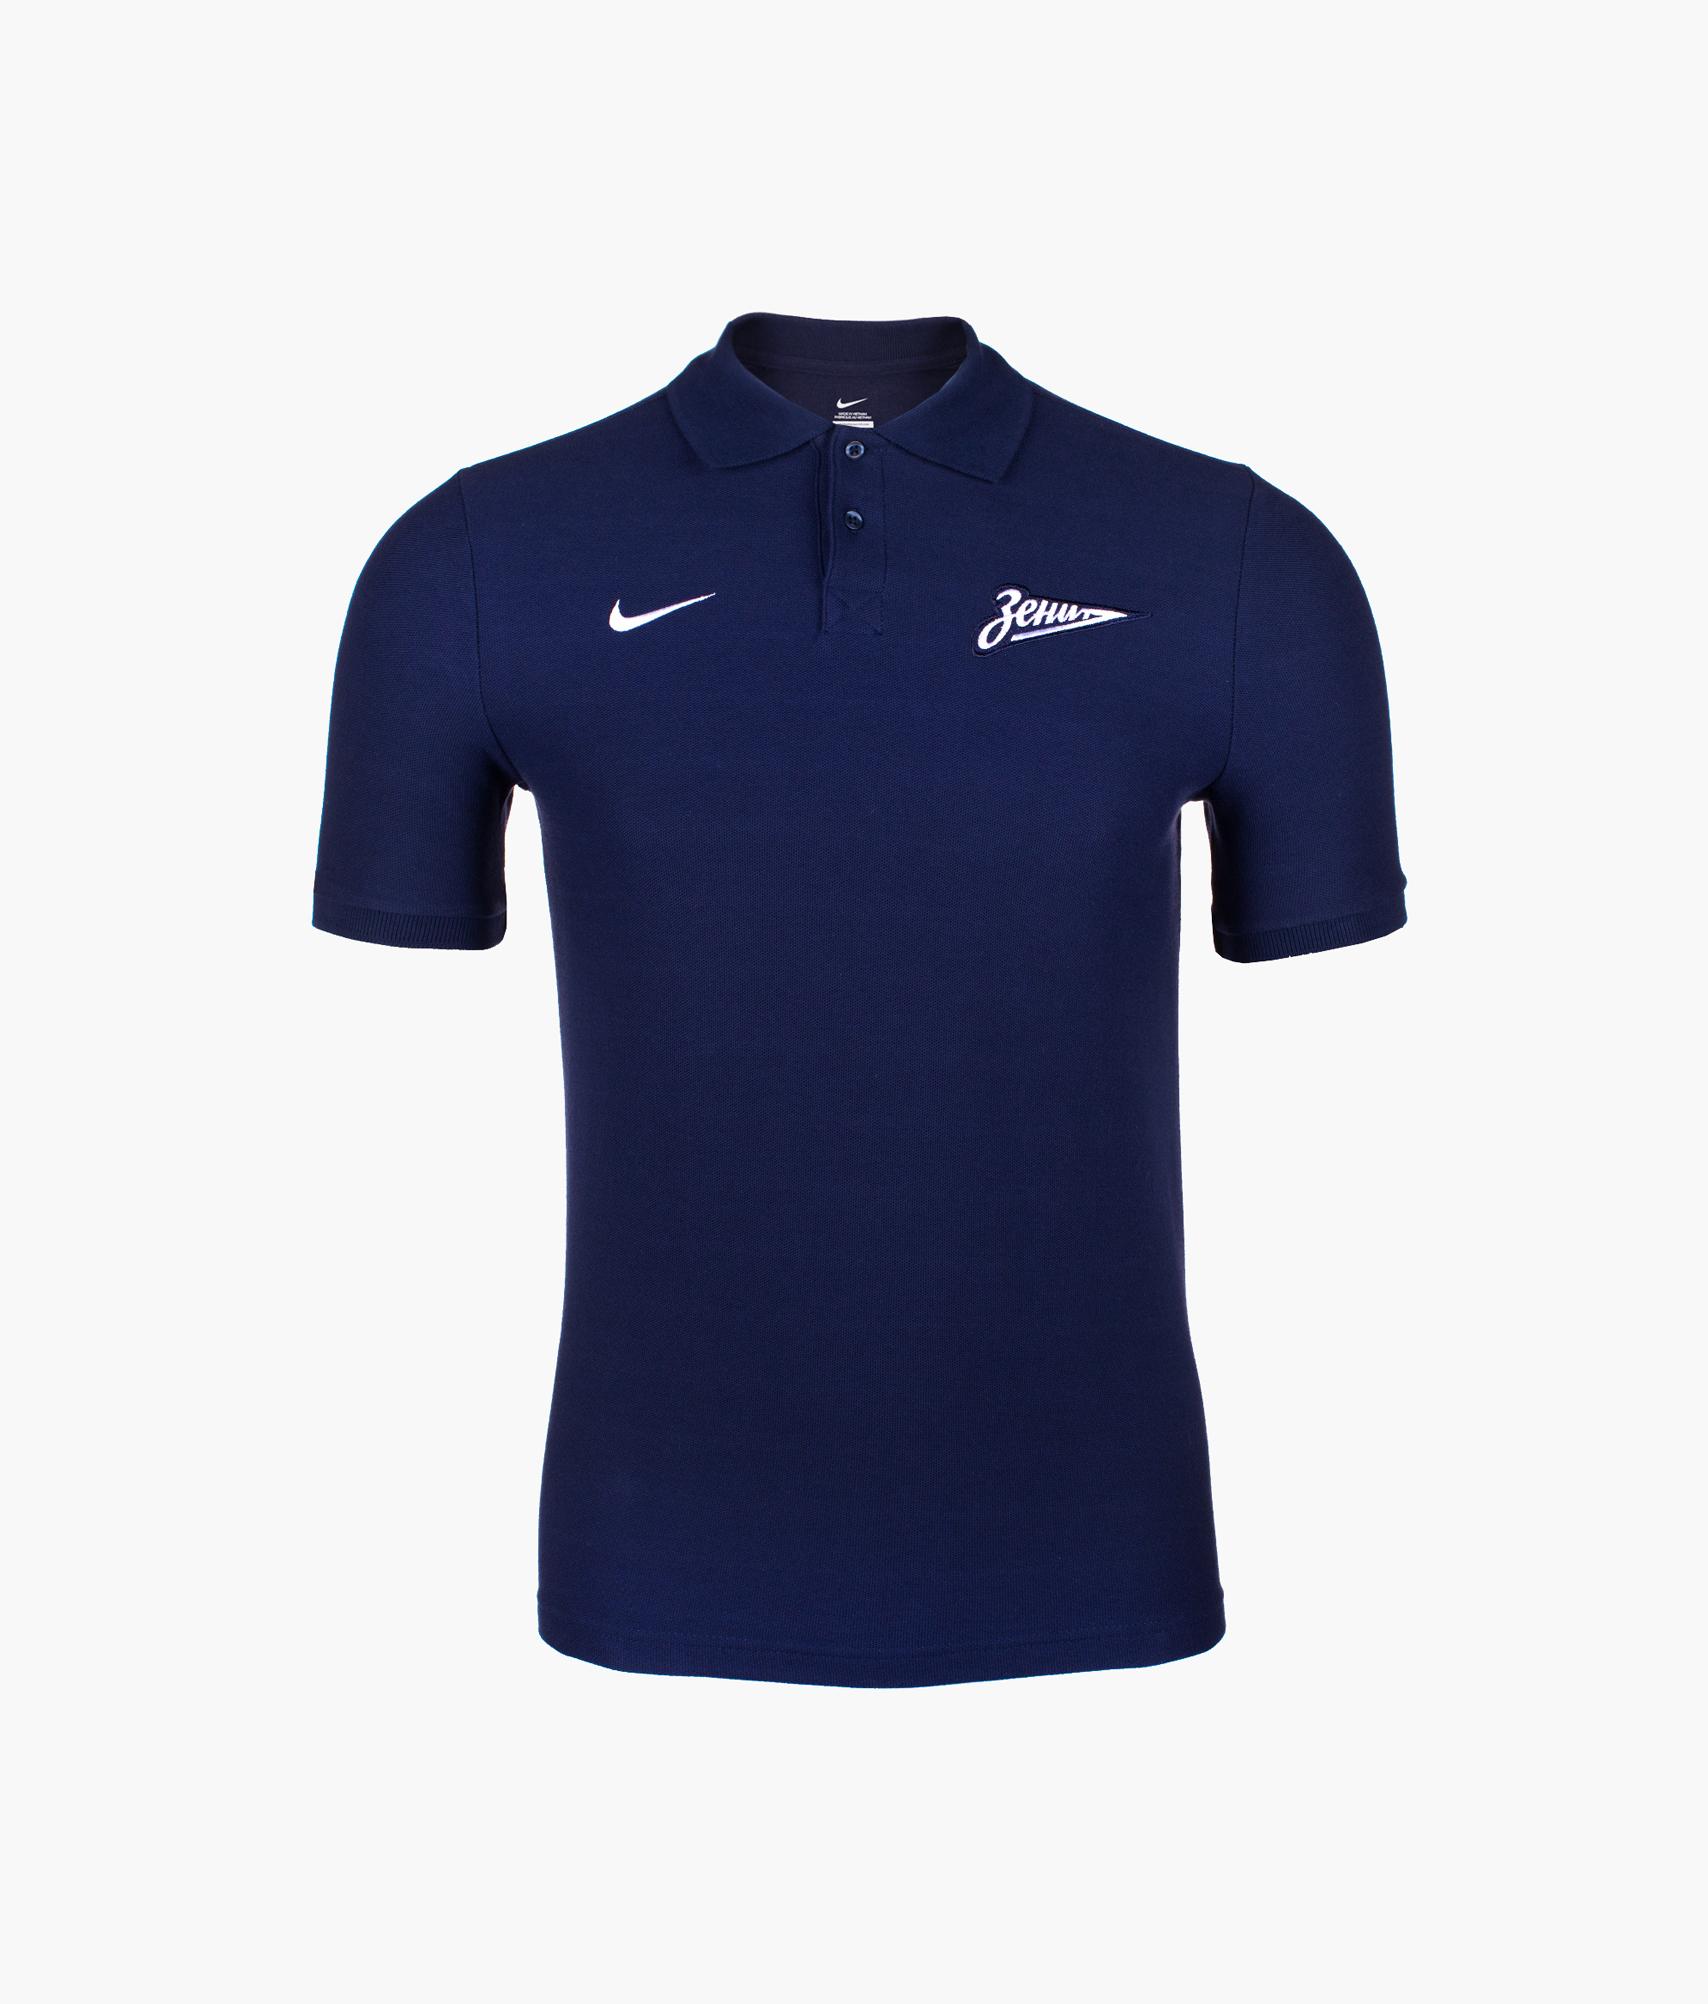 Поло подростковое Nike Nike Цвет-Темно-синий цена в Москве и Питере